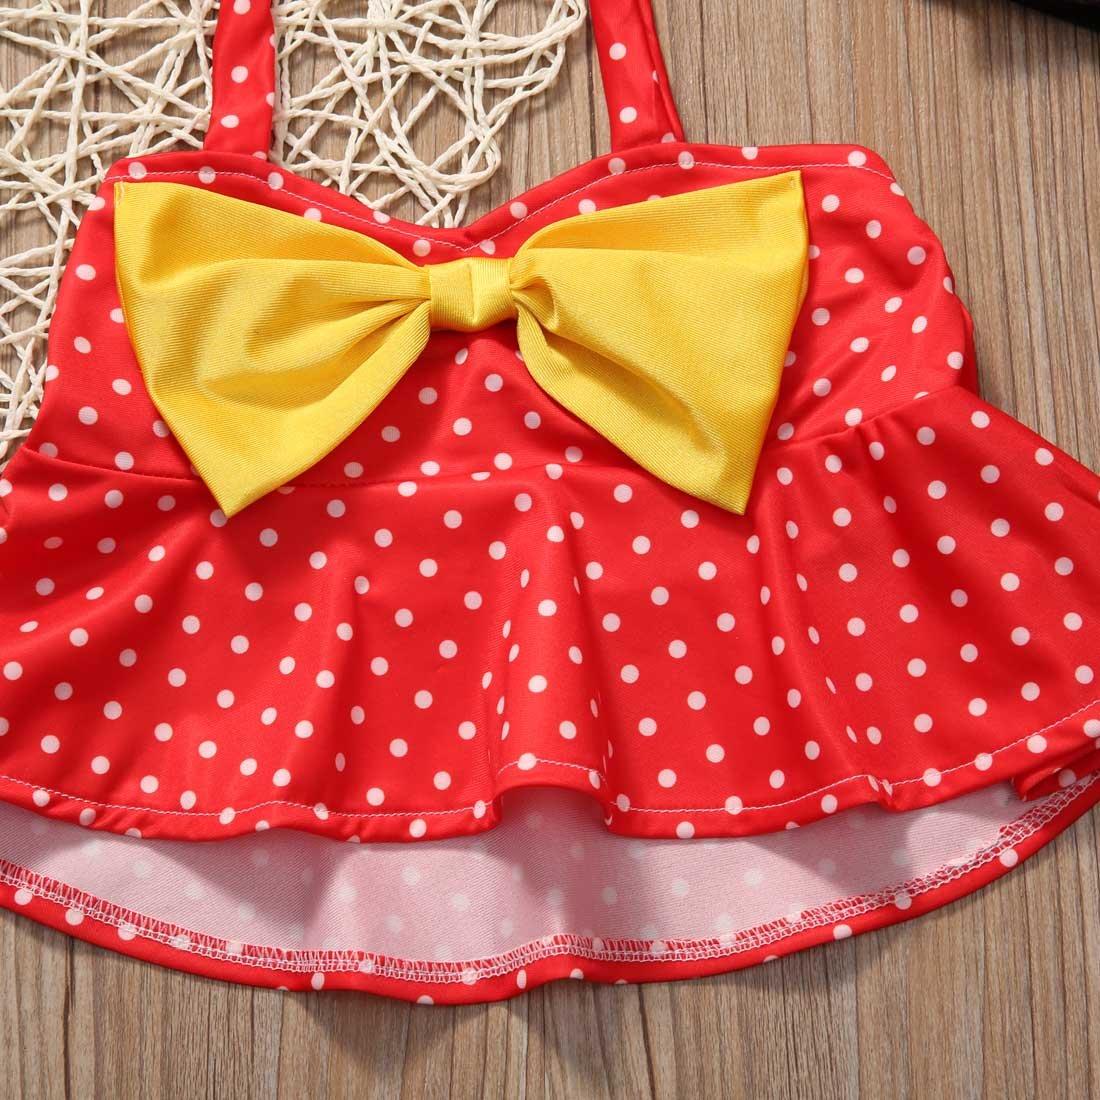 Ambabe 3PCS Toddler Baby Girl Bikini Set Polka Dot Ruffled Halter Crop Top+Shorts+Bowknot Headband Swimsuit Bathing Suit